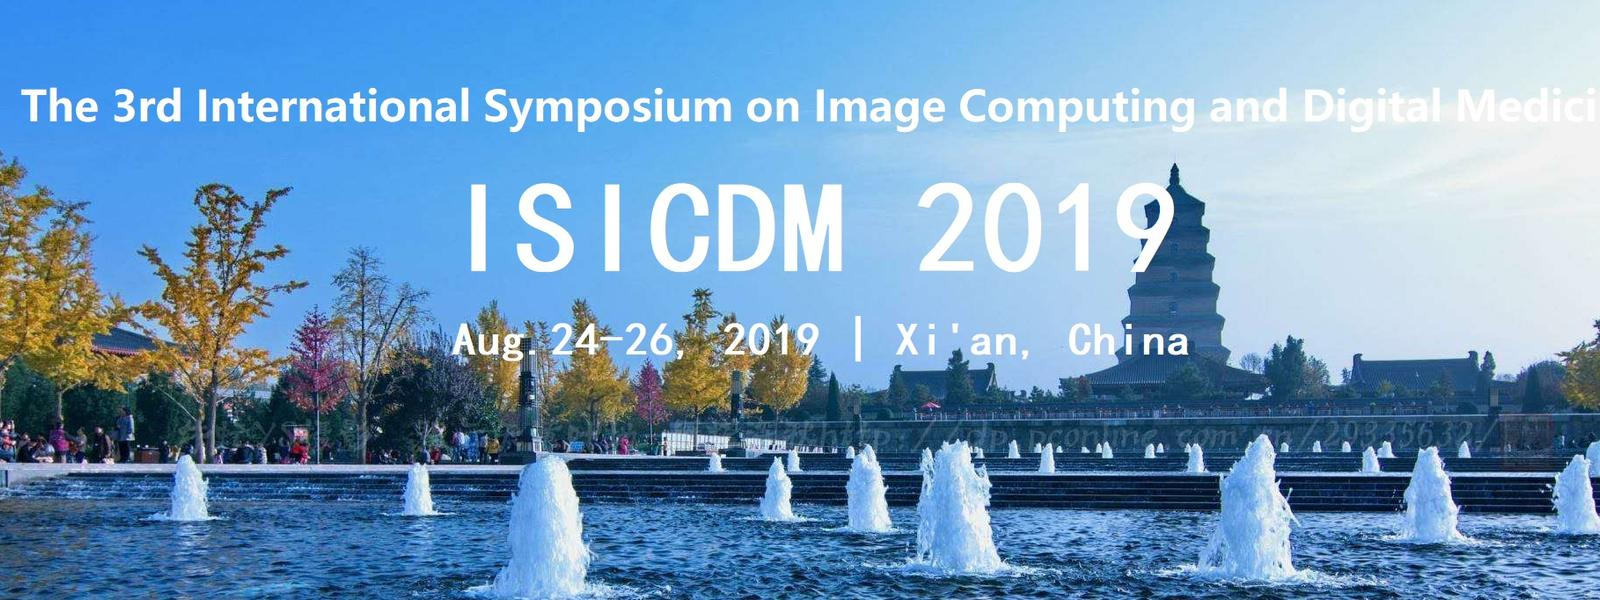 ISICDM 2019.jpg